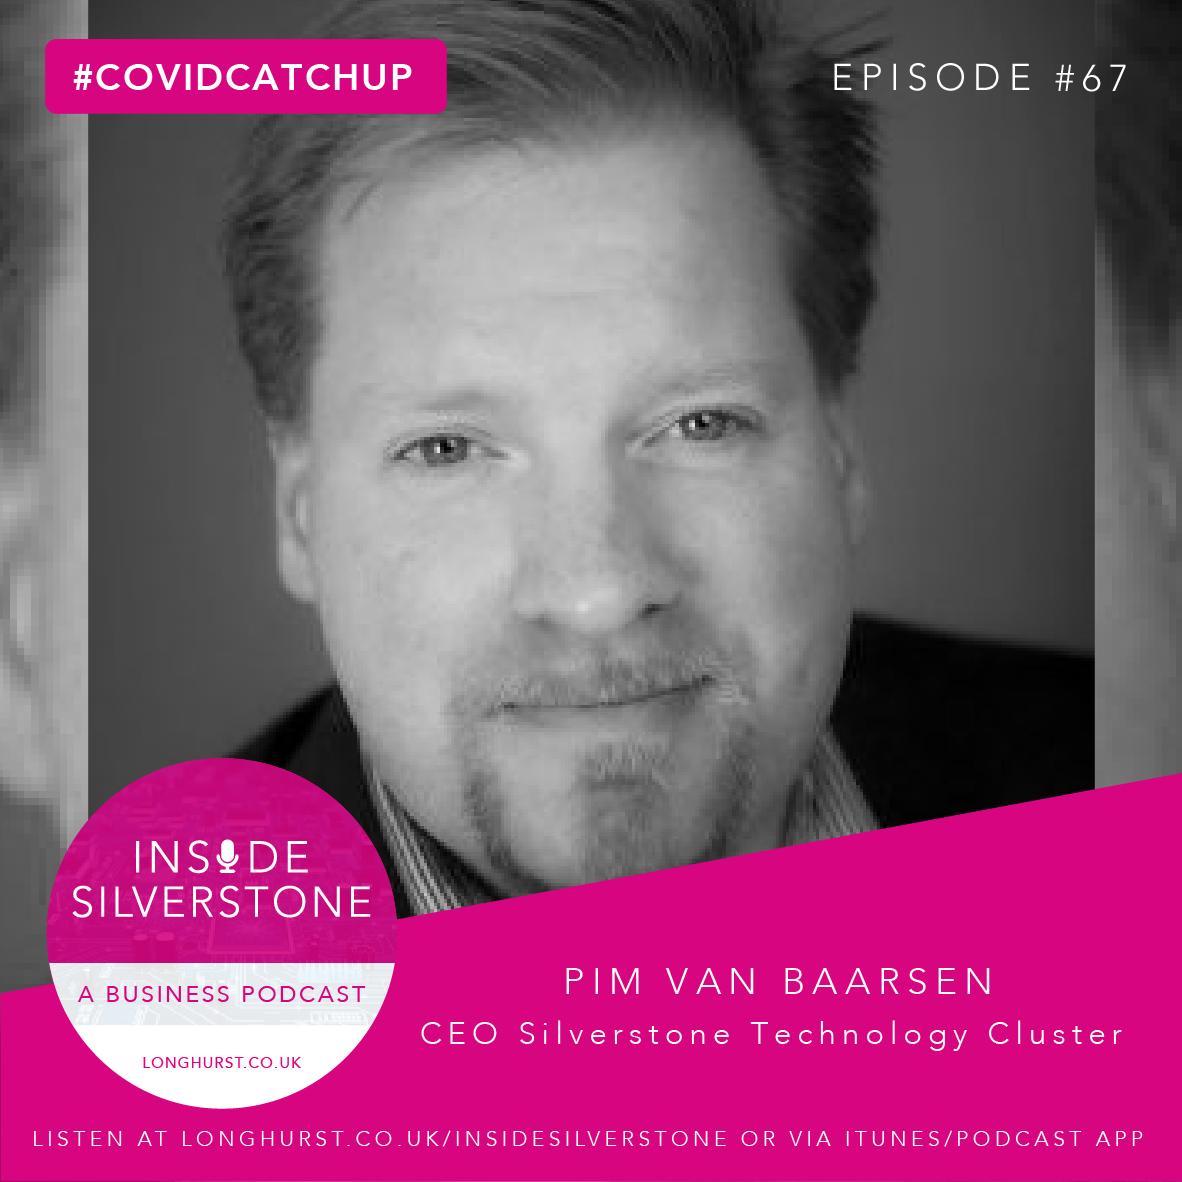 Pim van Baarsen from the Silverstone Technology Cluster